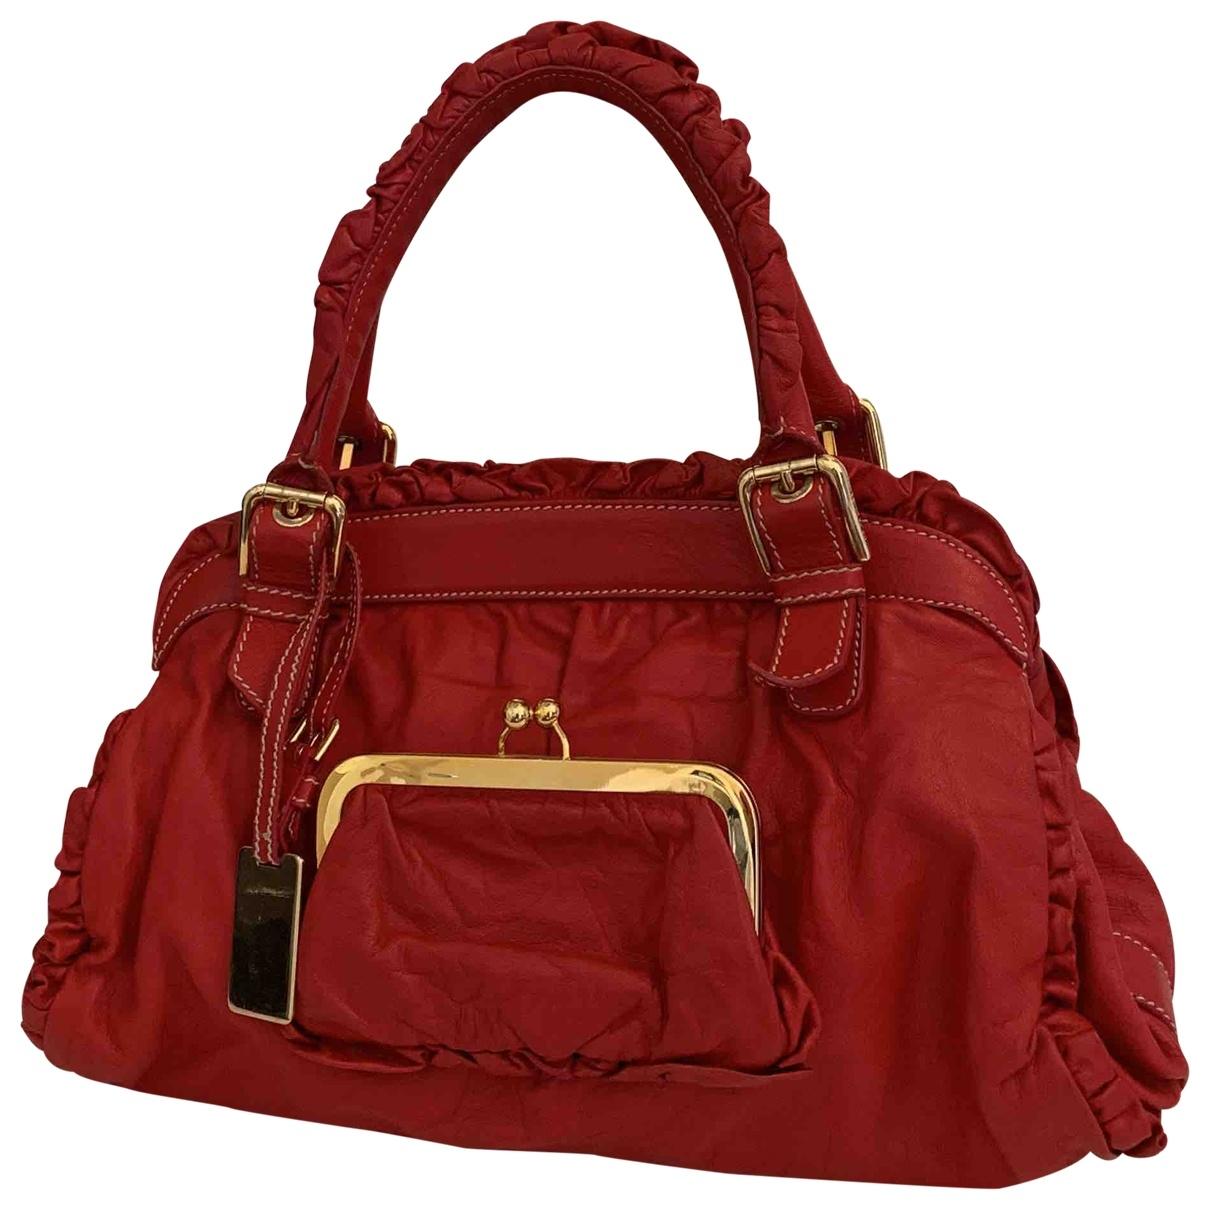 Dolce & Gabbana \N Red Leather handbag for Women \N